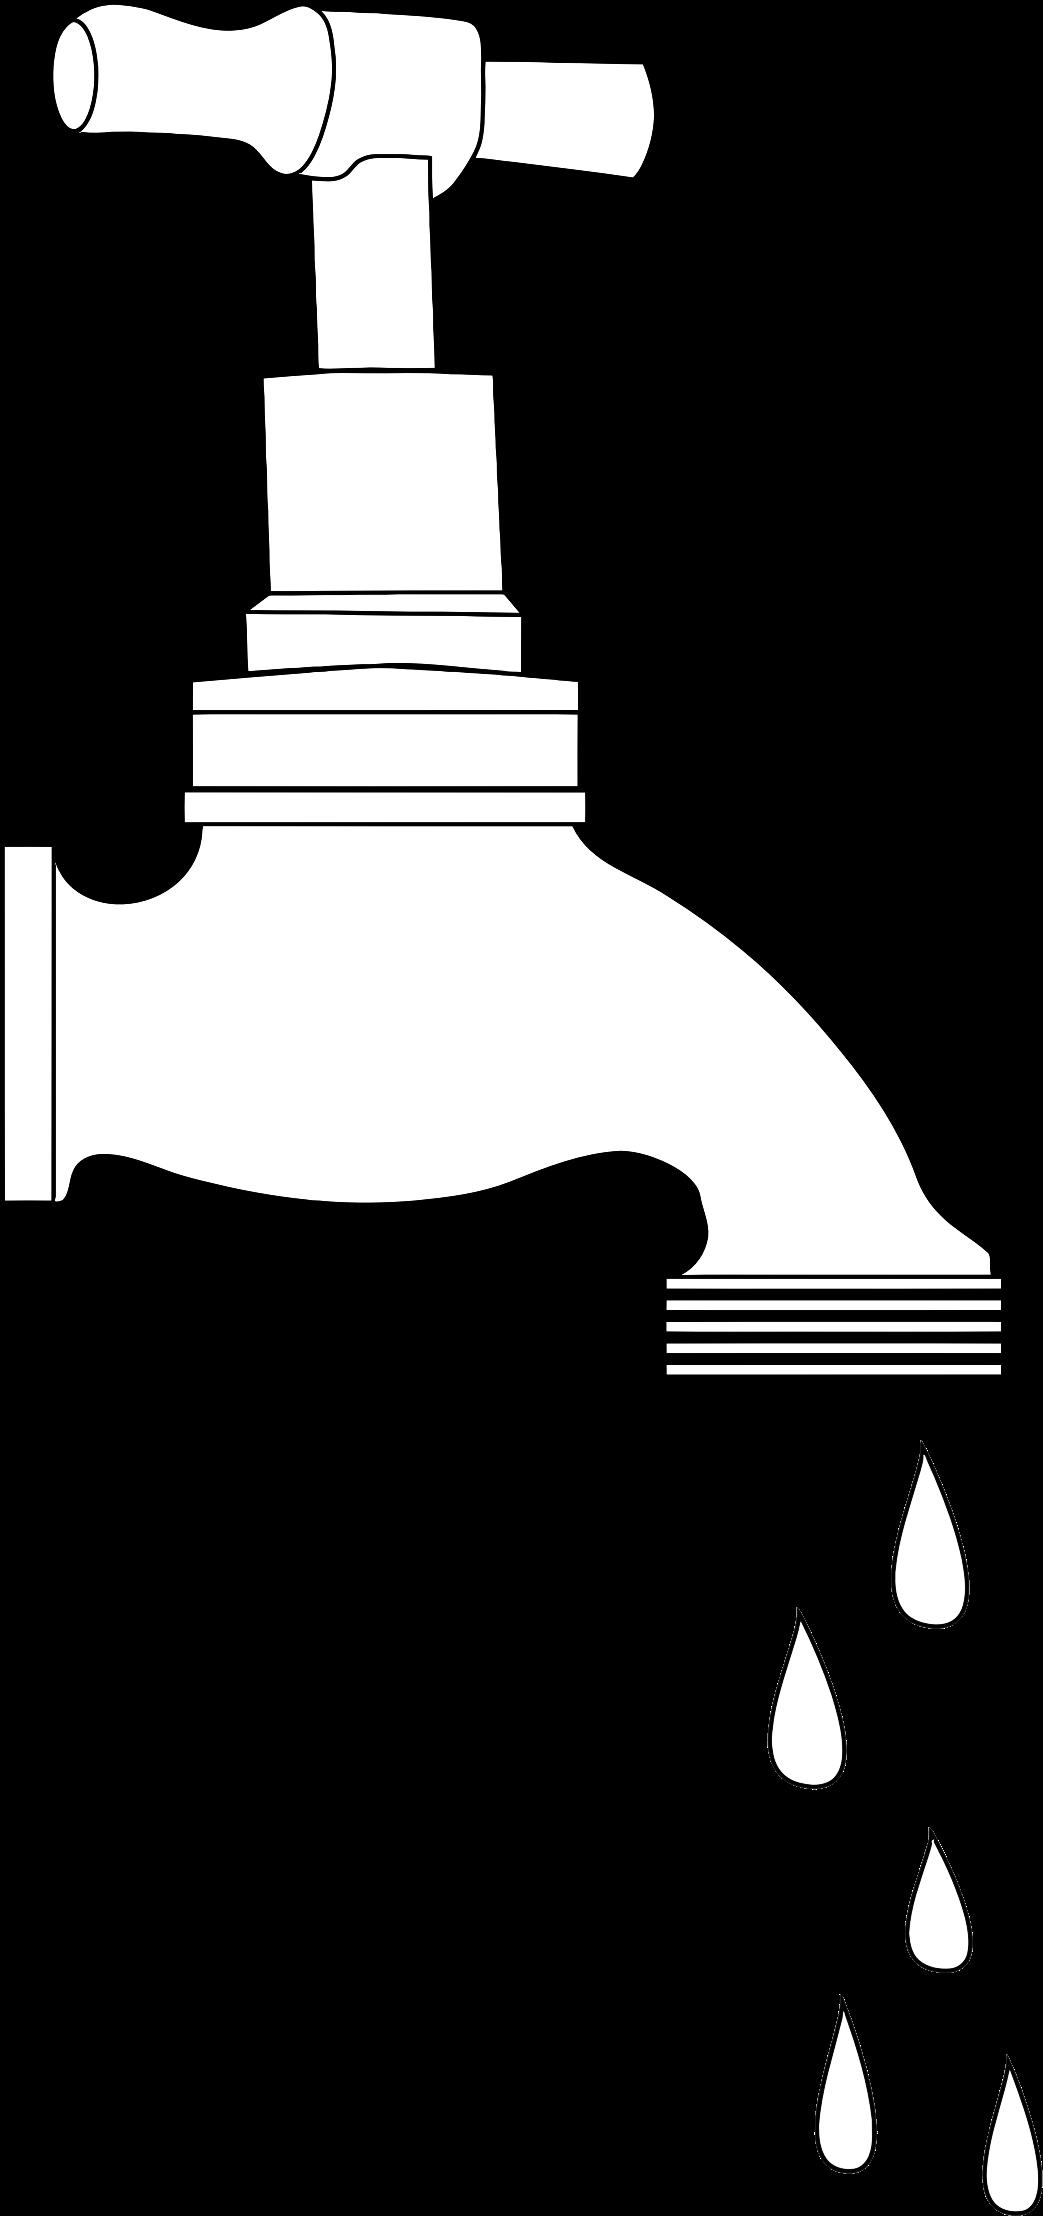 Tap line art big. Faucet clipart dripping faucet